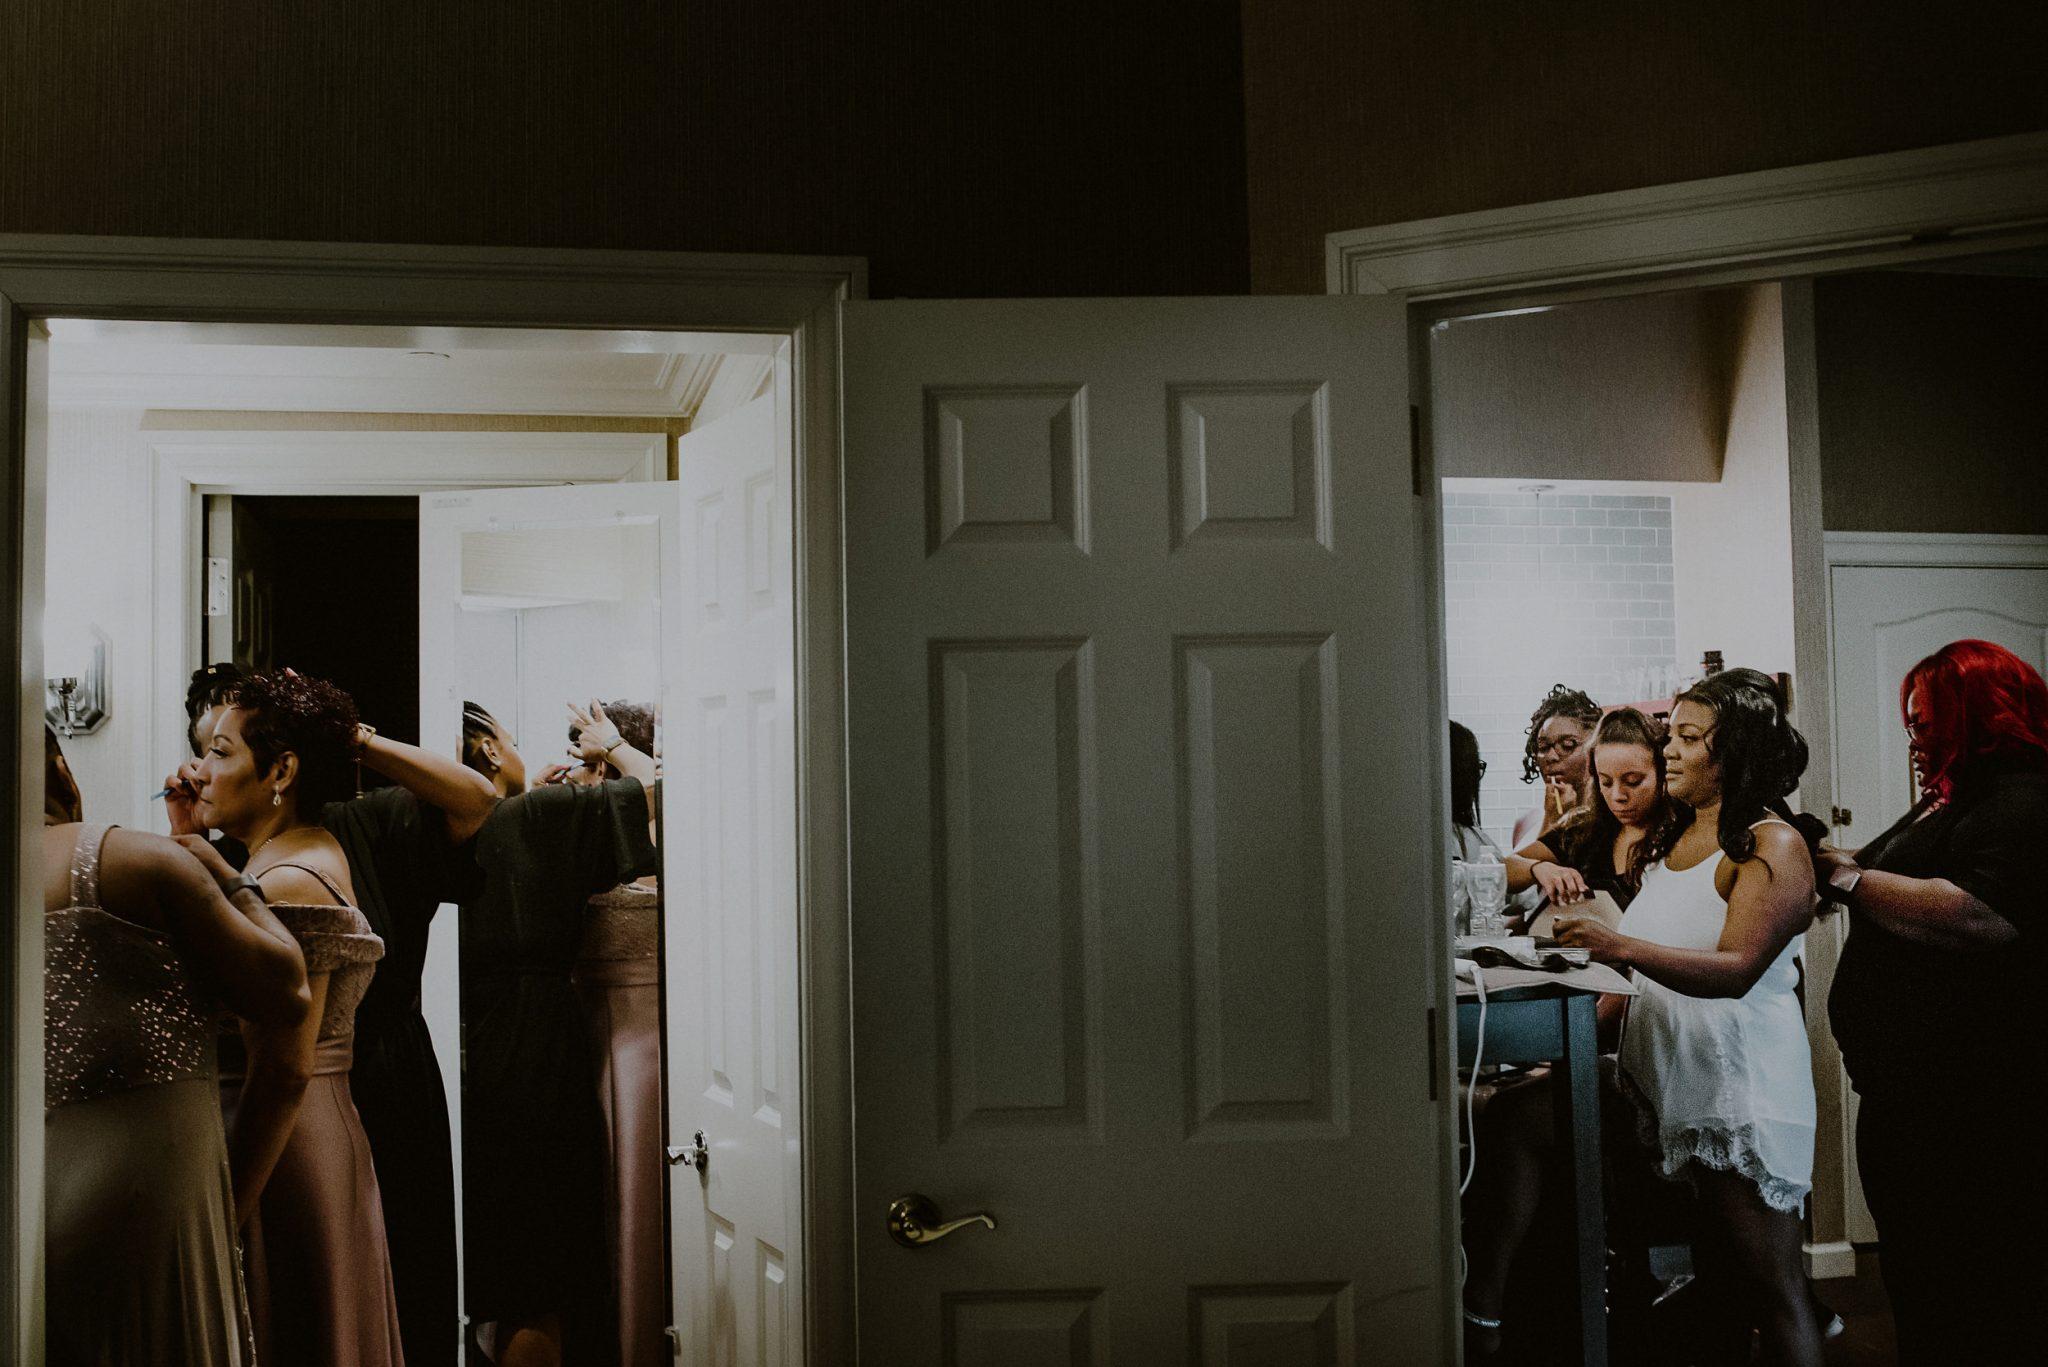 bridal party at hotel preparing for wedding at fox hollow